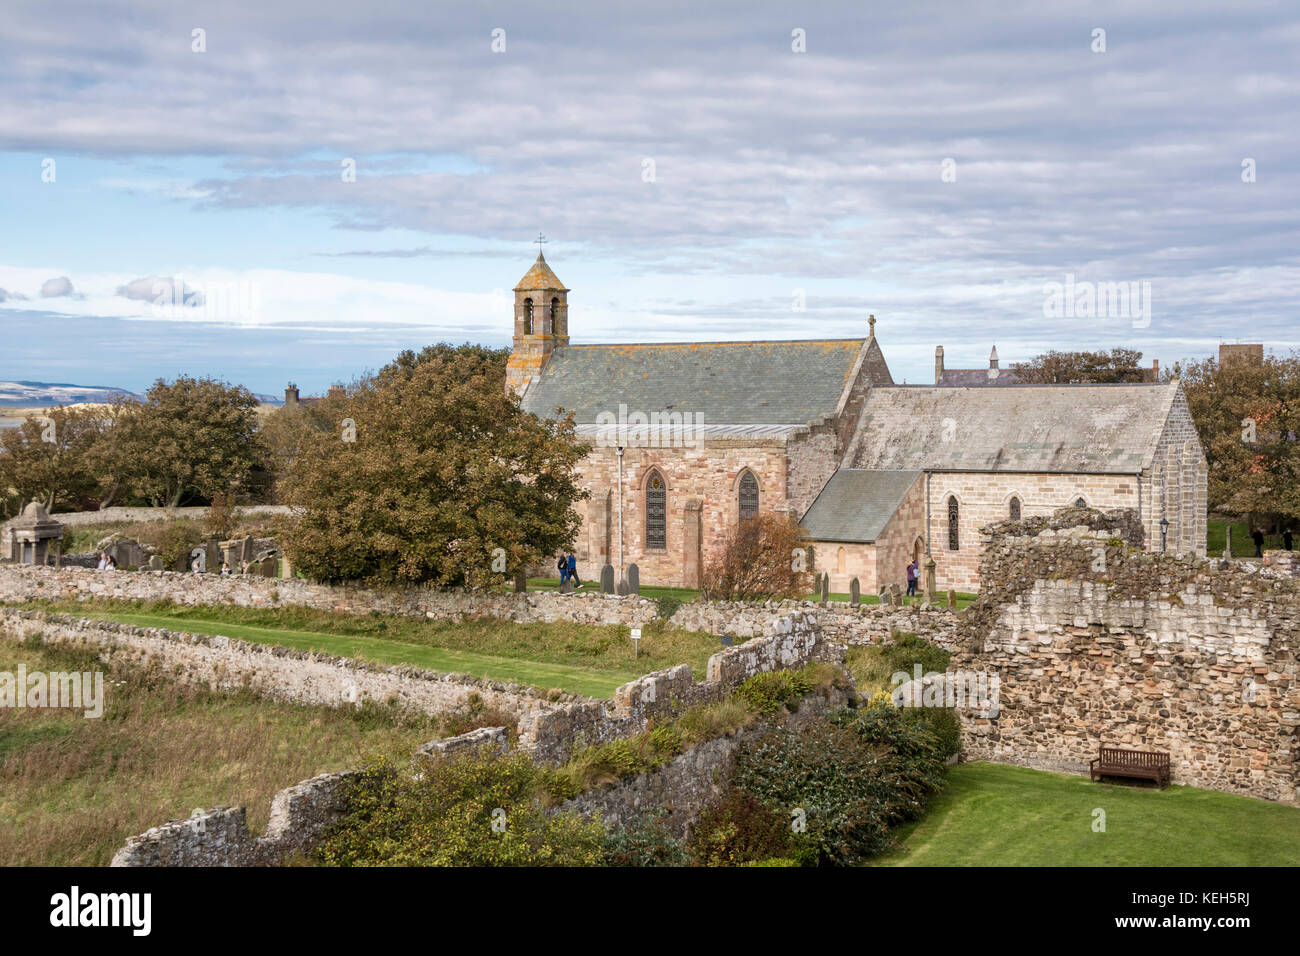 Lindisfarne Priory en Holy Island, Lindisfarne, Inglaterra, Reino Unido. Foto de stock